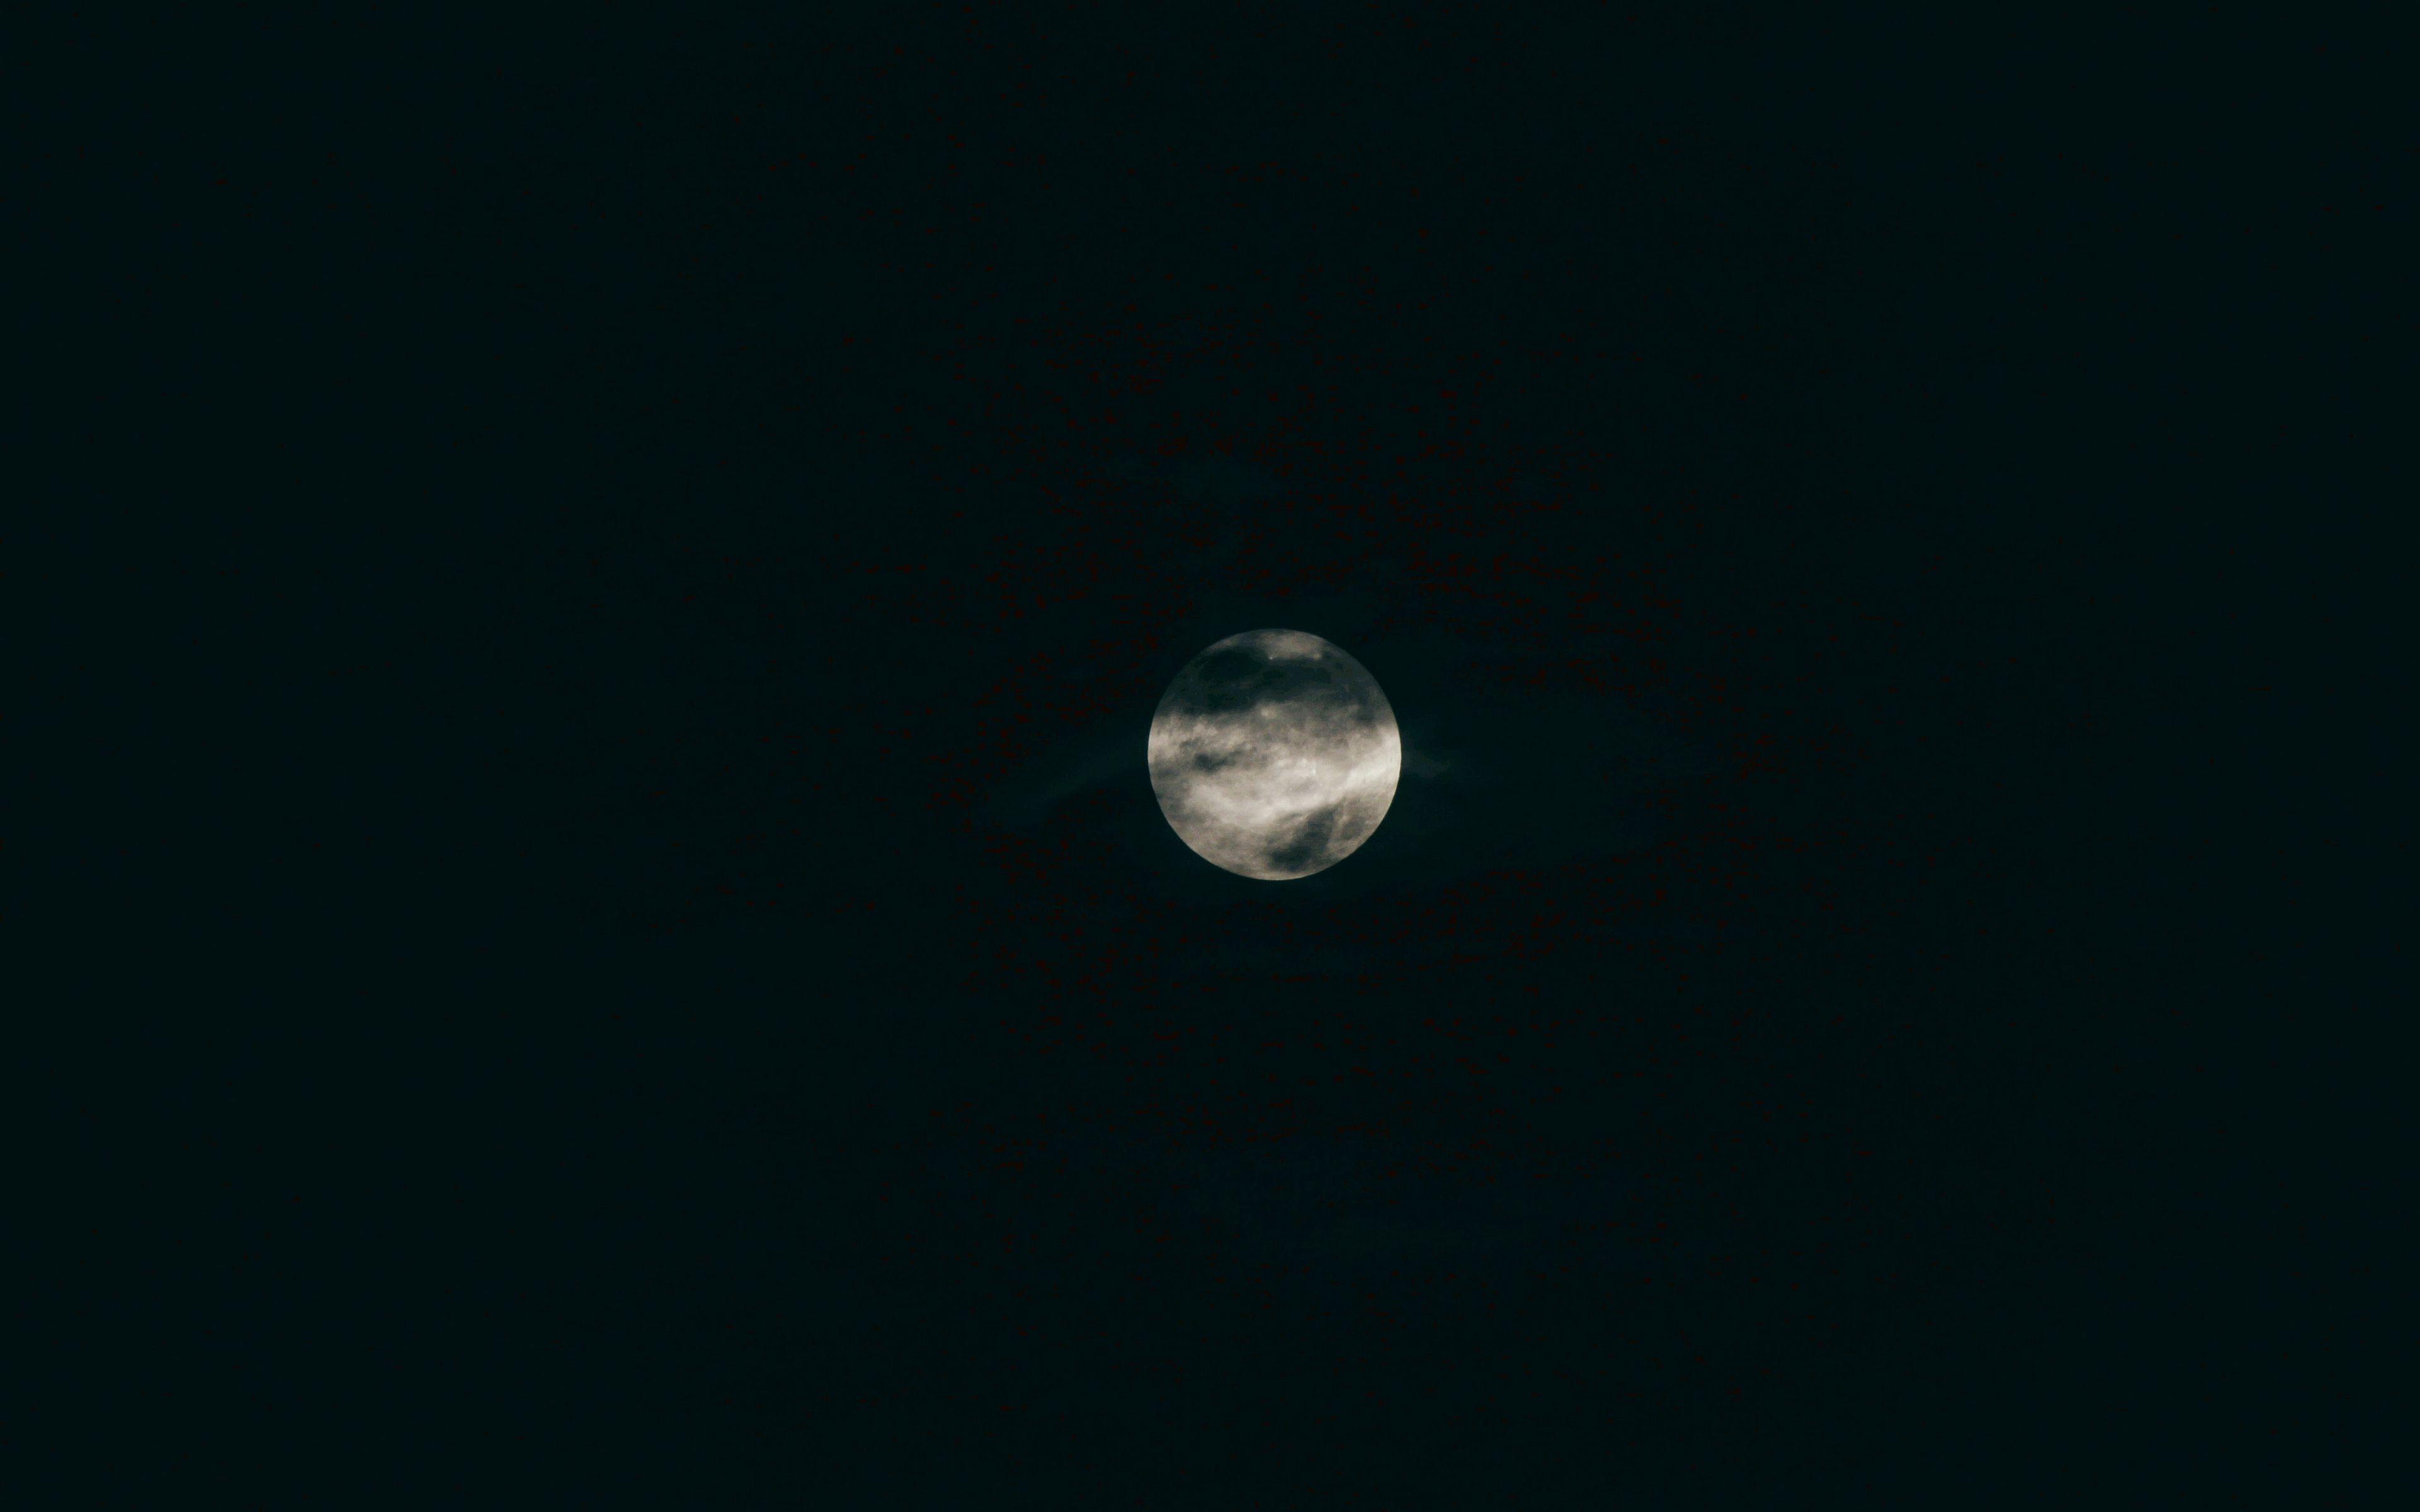 3840x2400 Wallpaper moon, full moon, planet